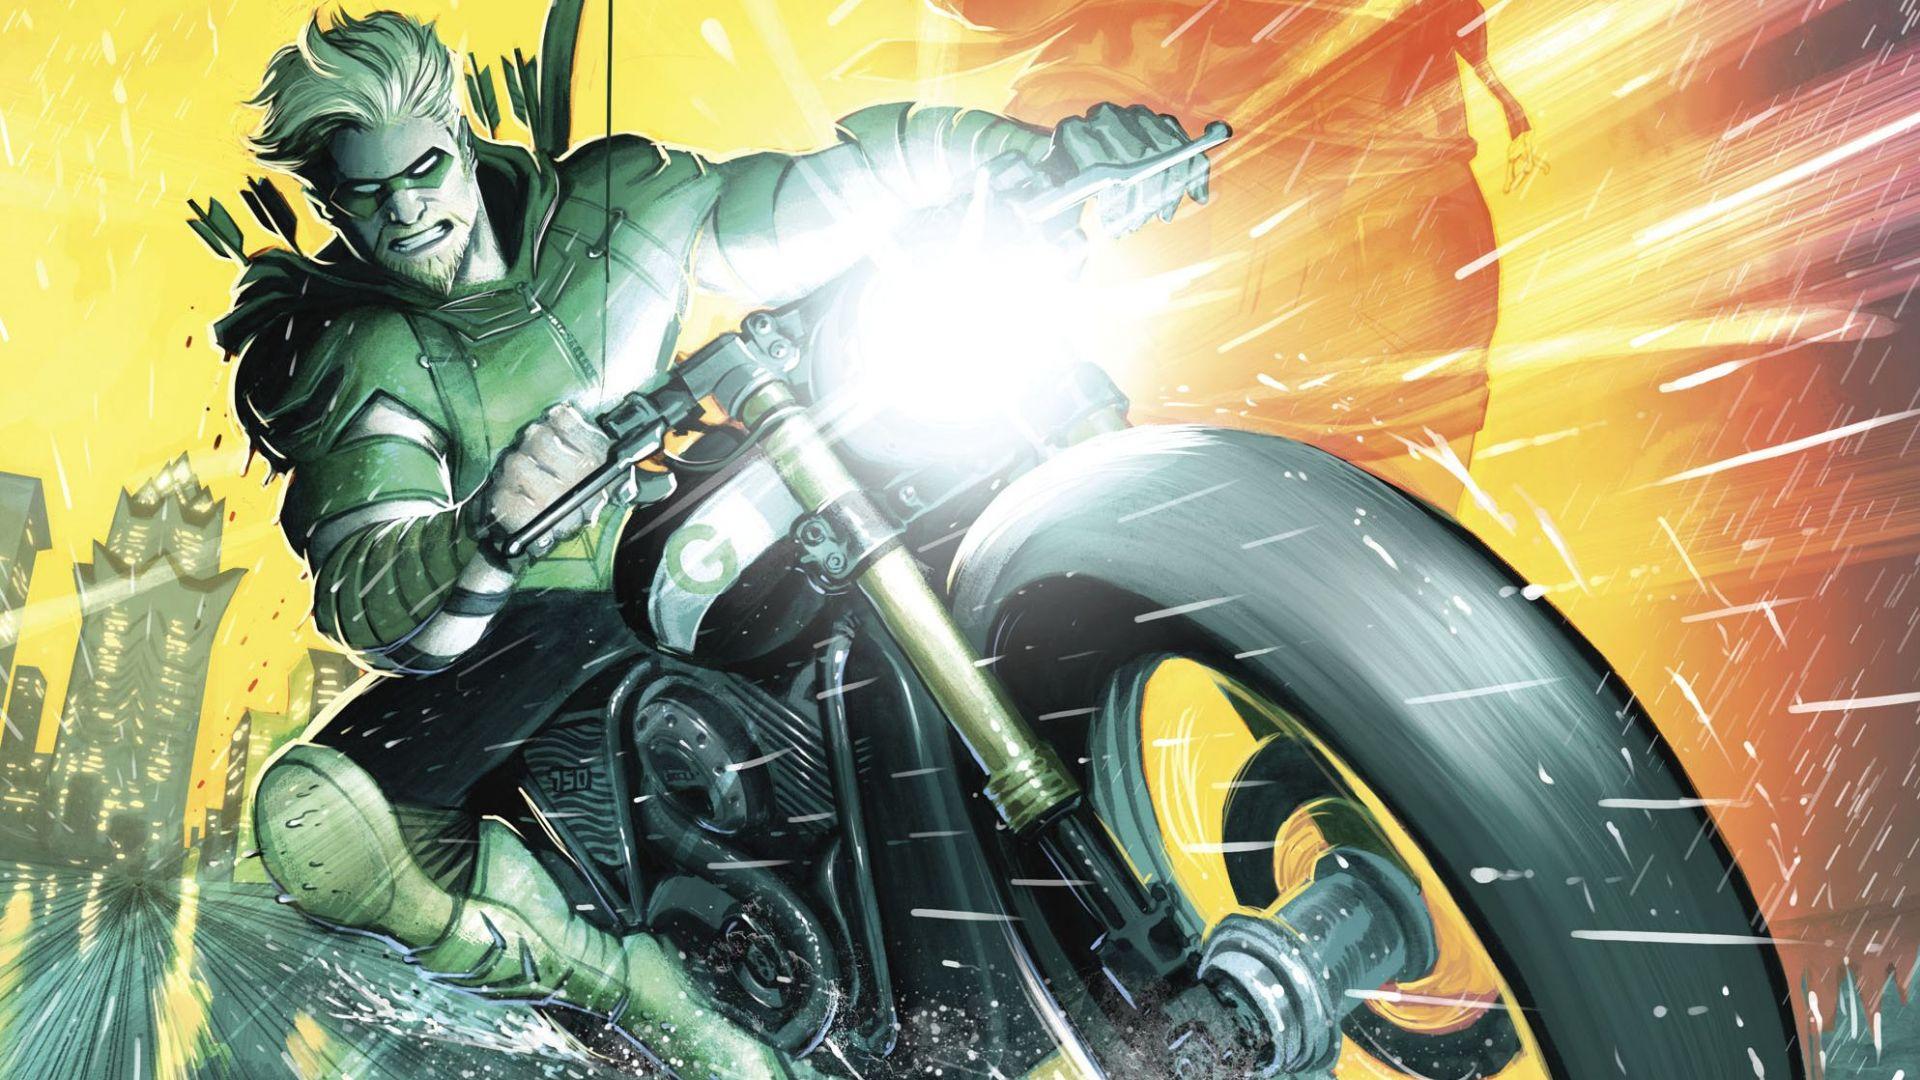 Desktop Wallpaper Green Arrow Riding Bike Dc Comics Hd